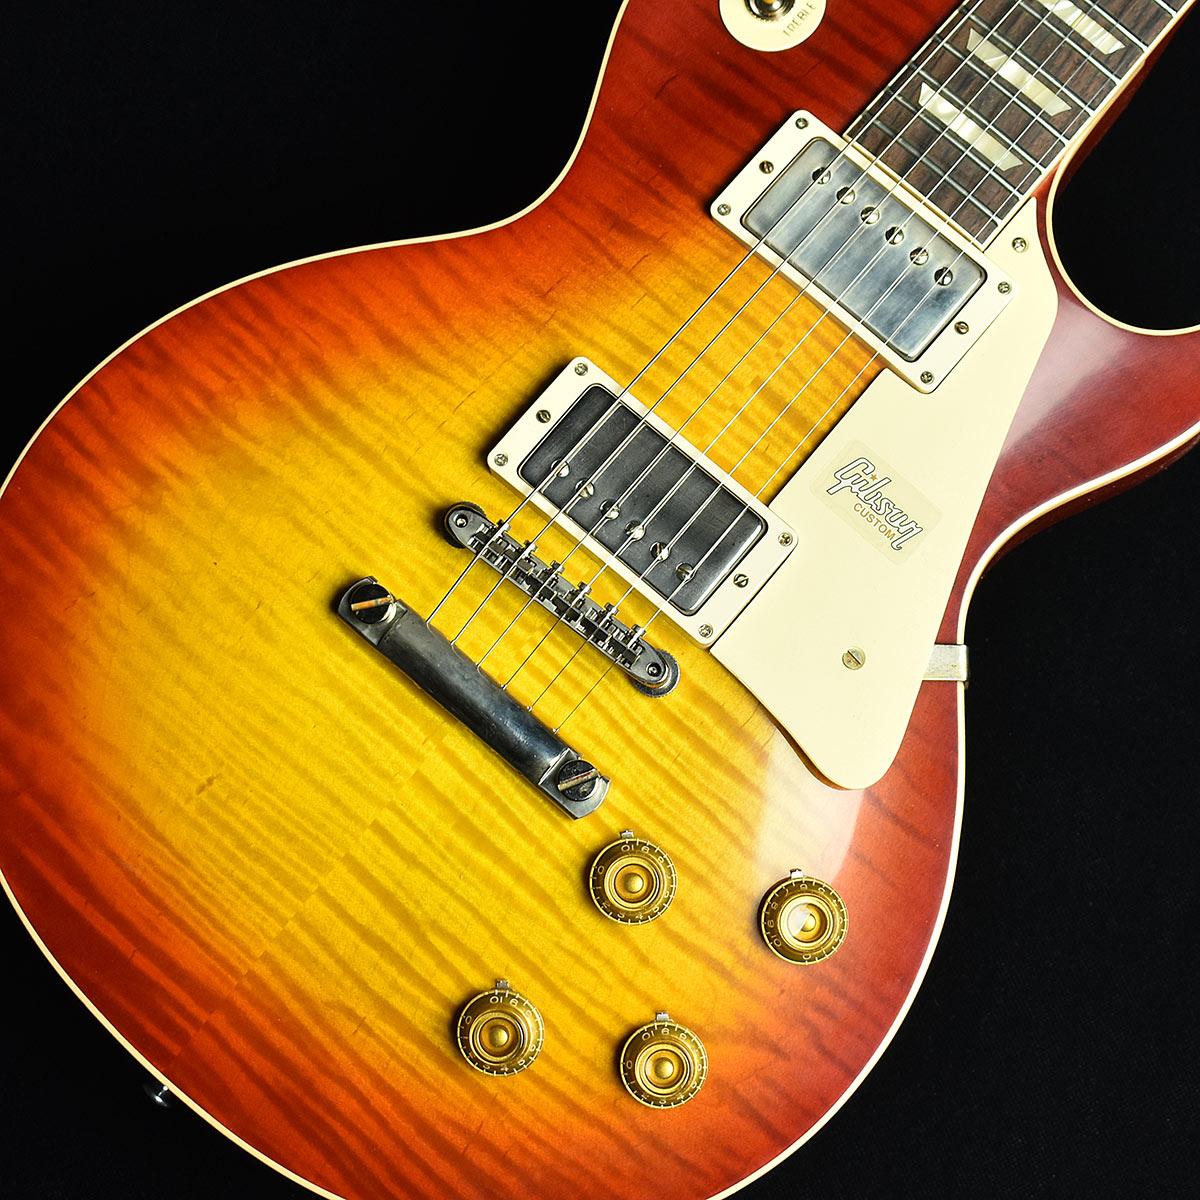 Gibson Custom Shop 60th 1959 Les Paul Standard VOS Dark Cherry Burst S/N:993867 【ギブソン カスタムショップ】【60th Anniversary】【現地選定材オーダー品】【未展示品】